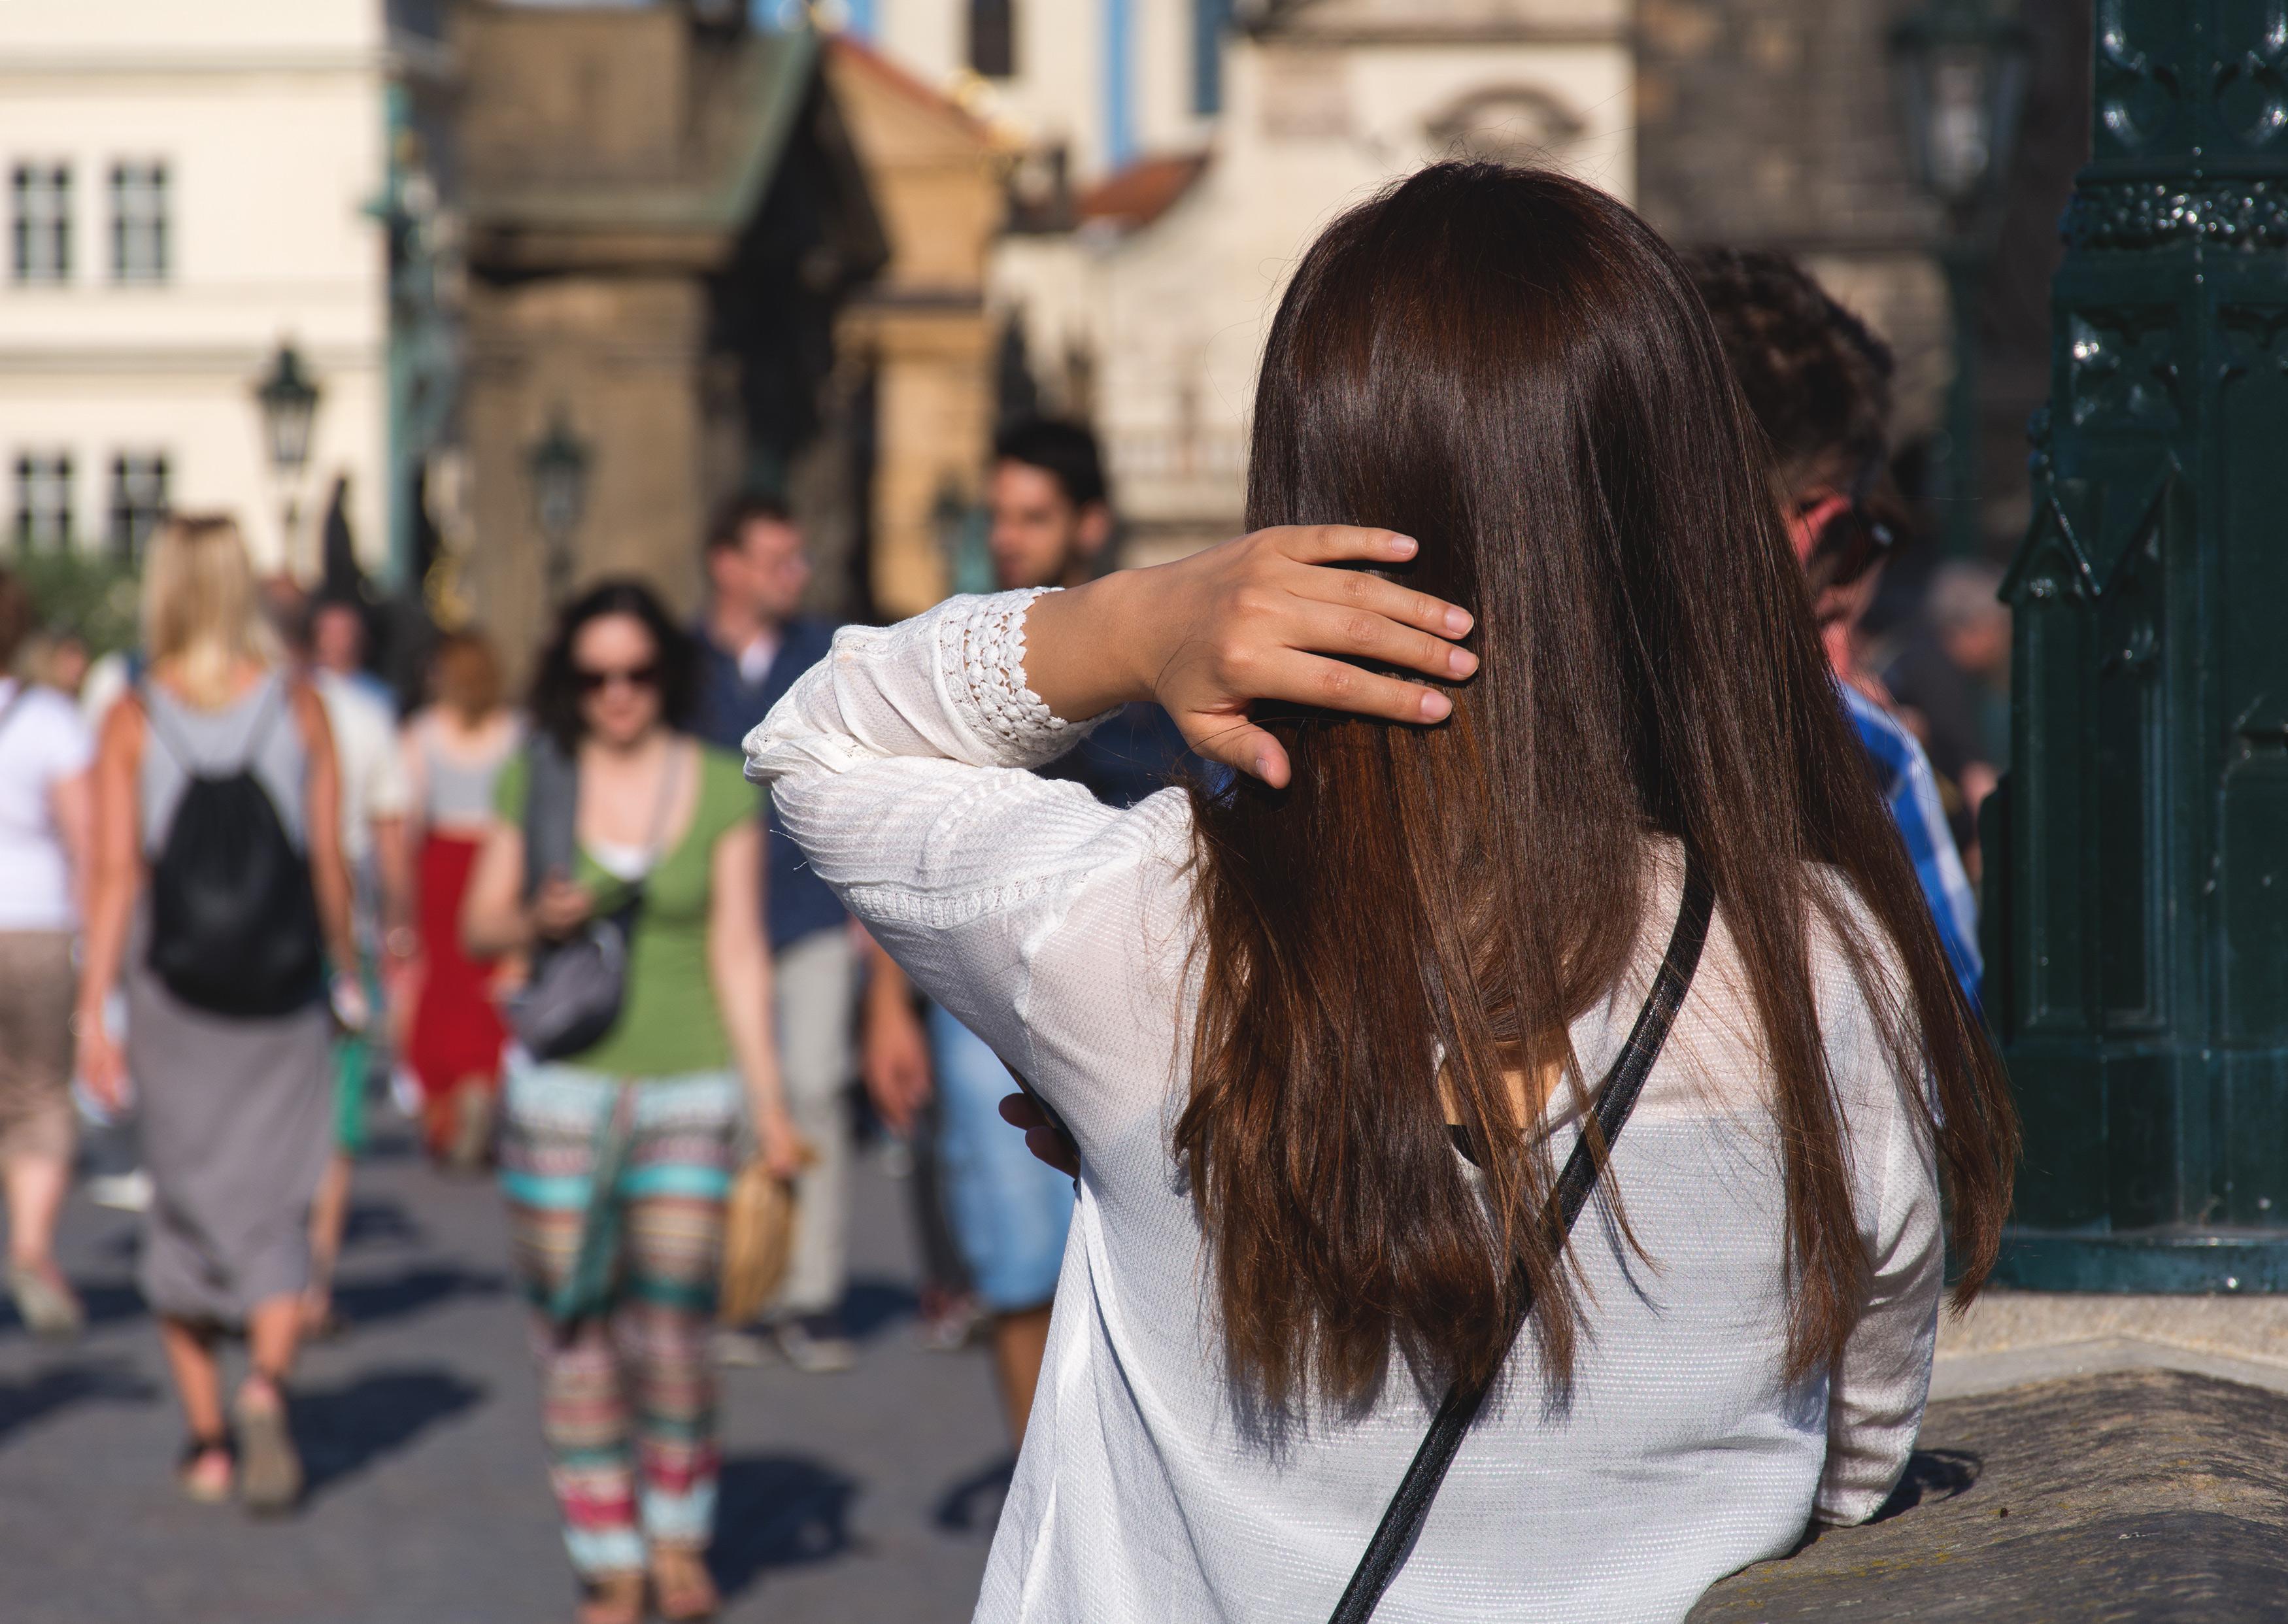 Brown hair woman | Free Stock Photo | LibreShot